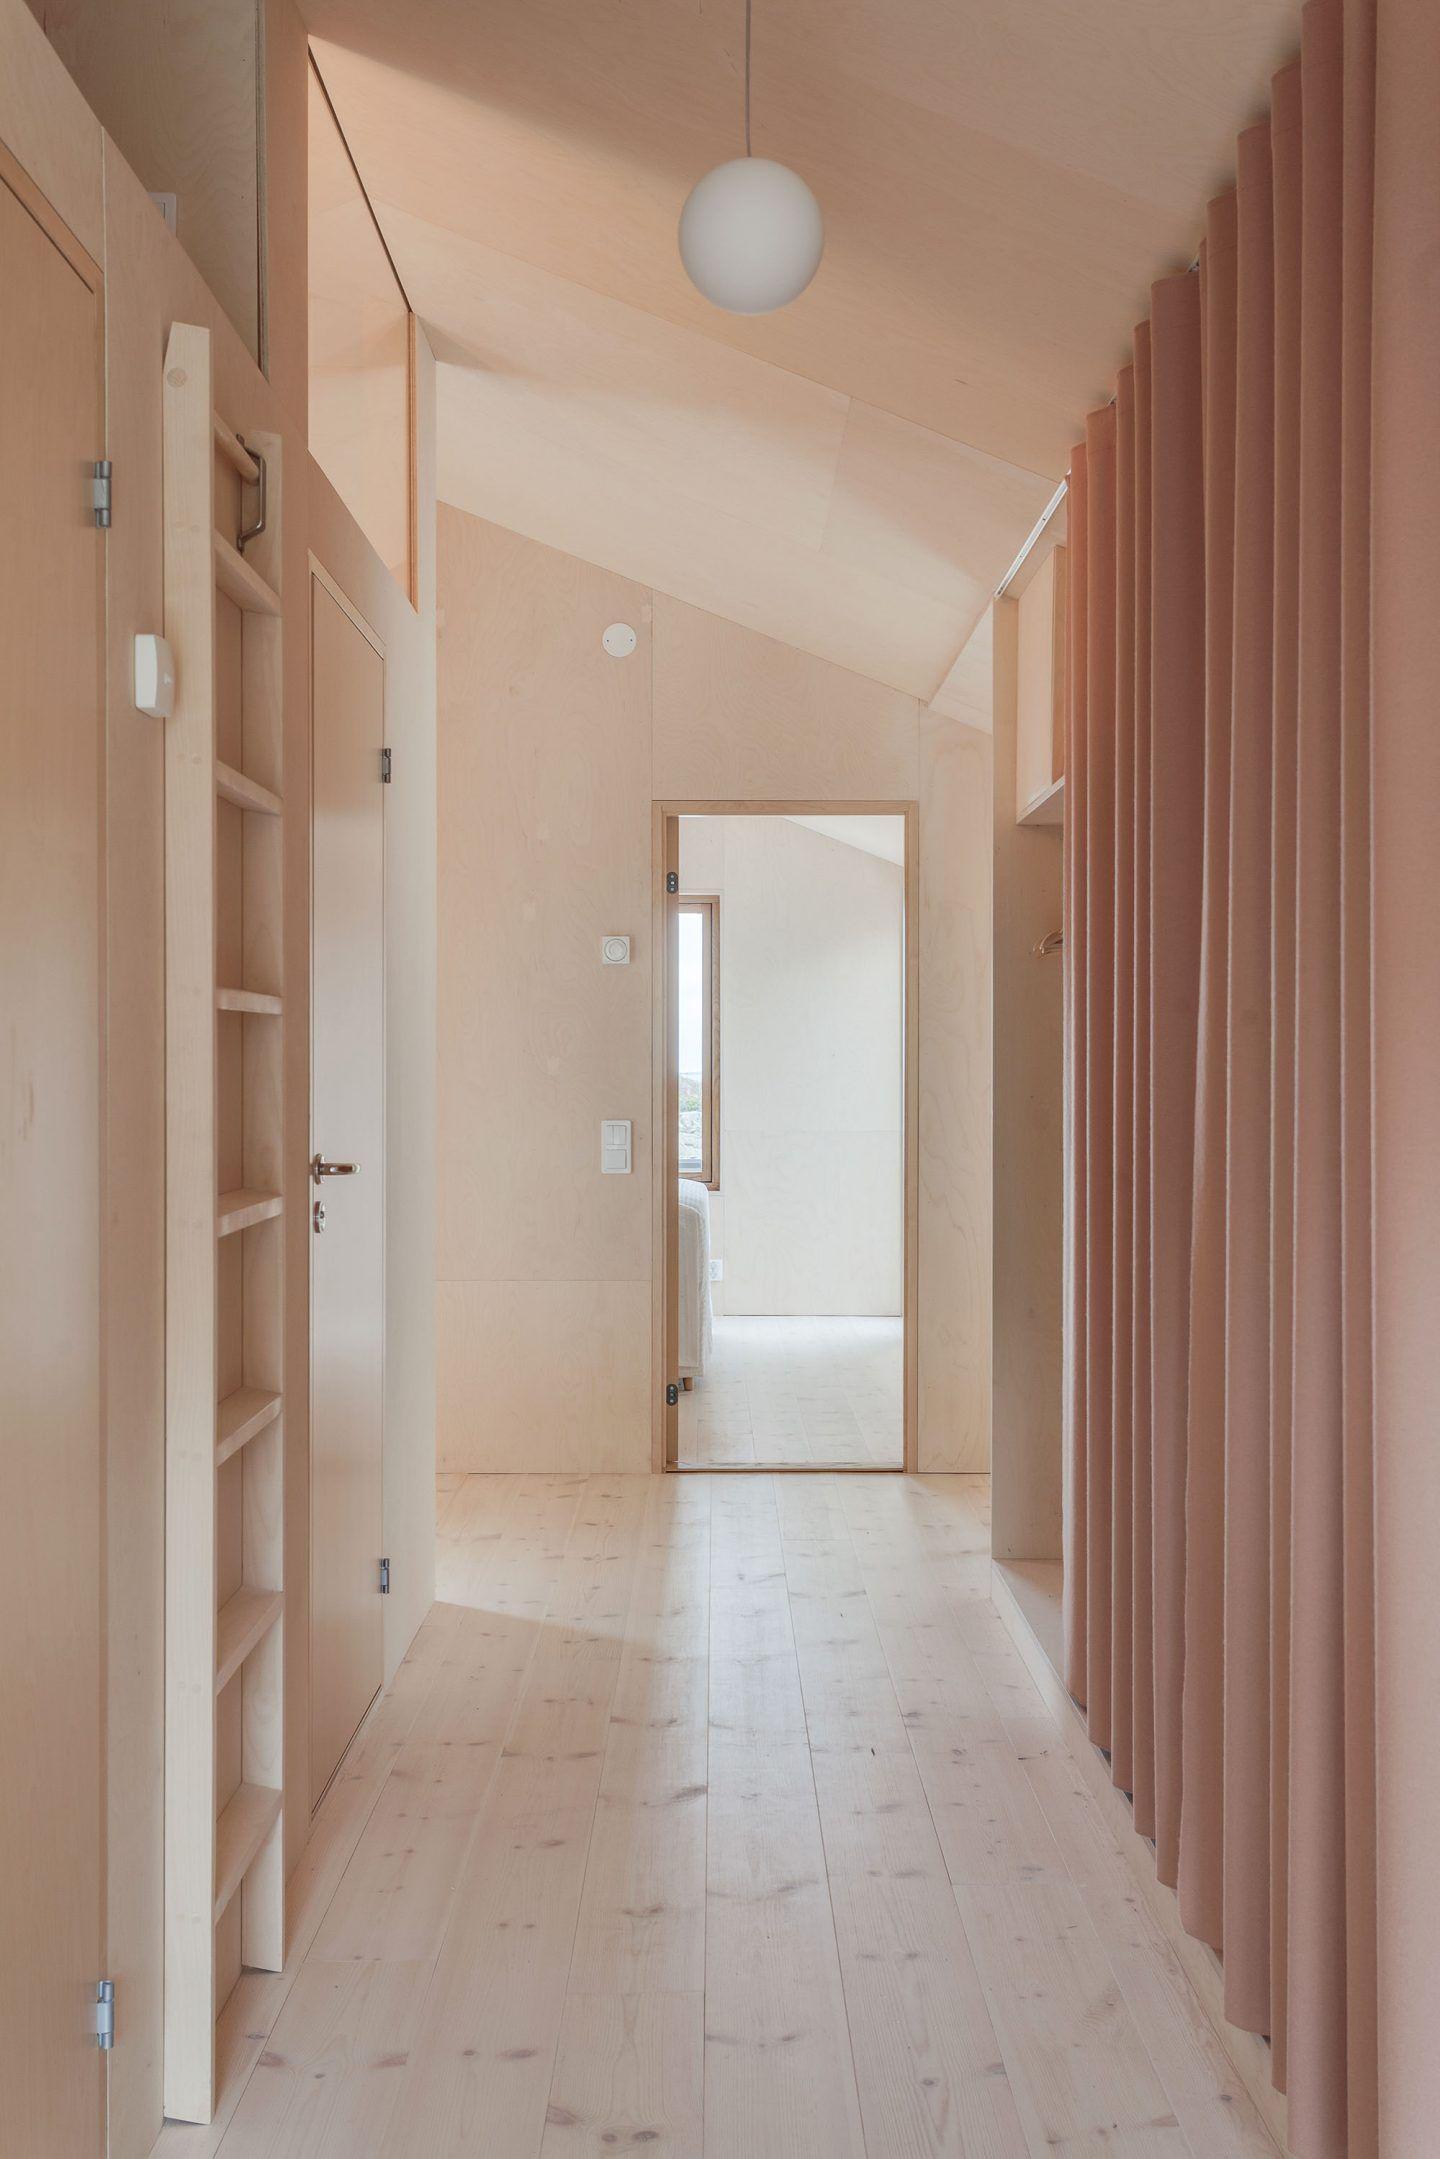 IGNANT-Architecture-Villa-Vassdal-Studio-Holmberg-09